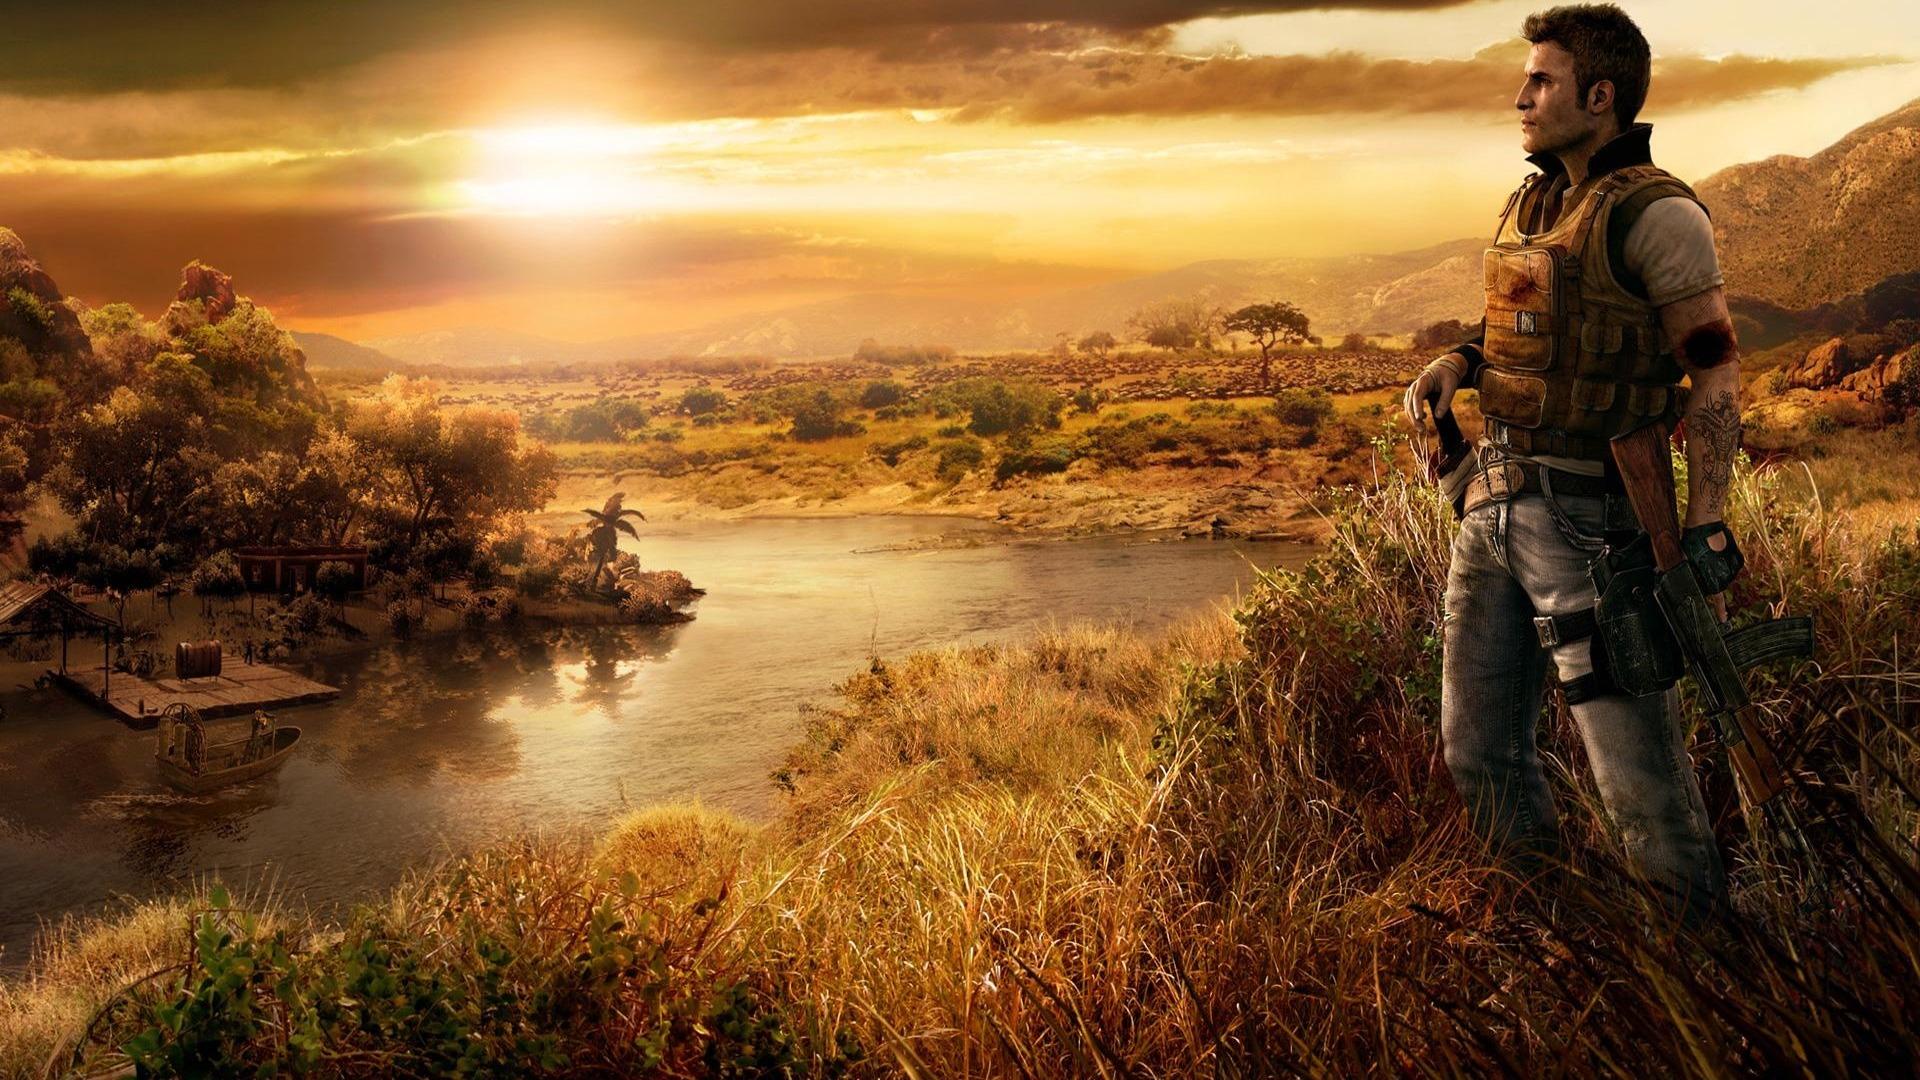 2012 Far Cry 3 Game Hd Wallpaper 12 Preview 10wallpaper Com